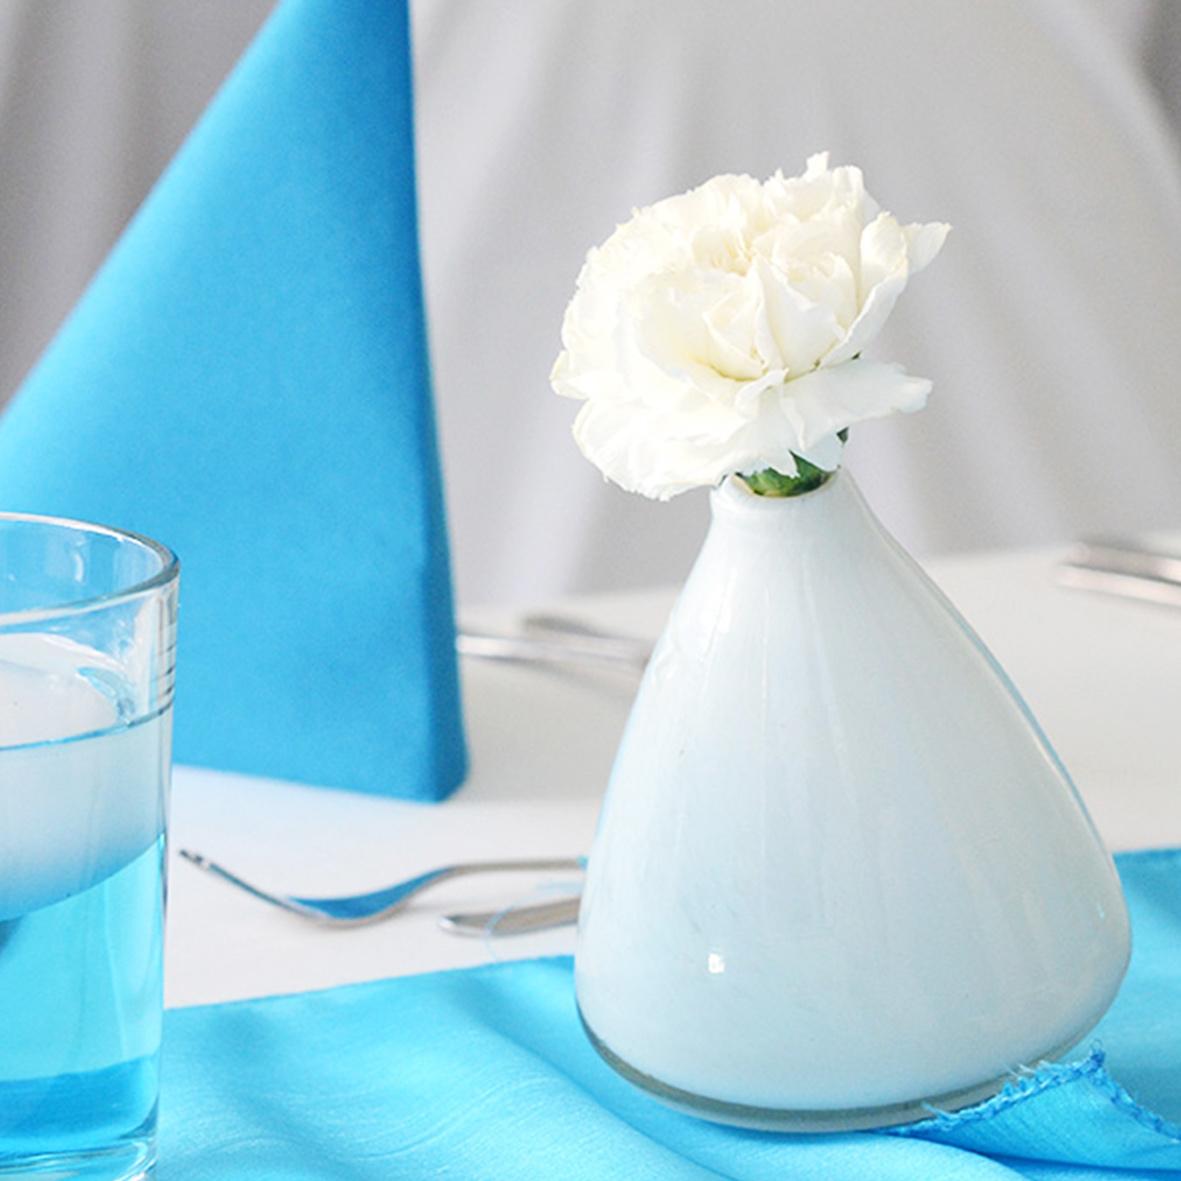 Vase Tumbling